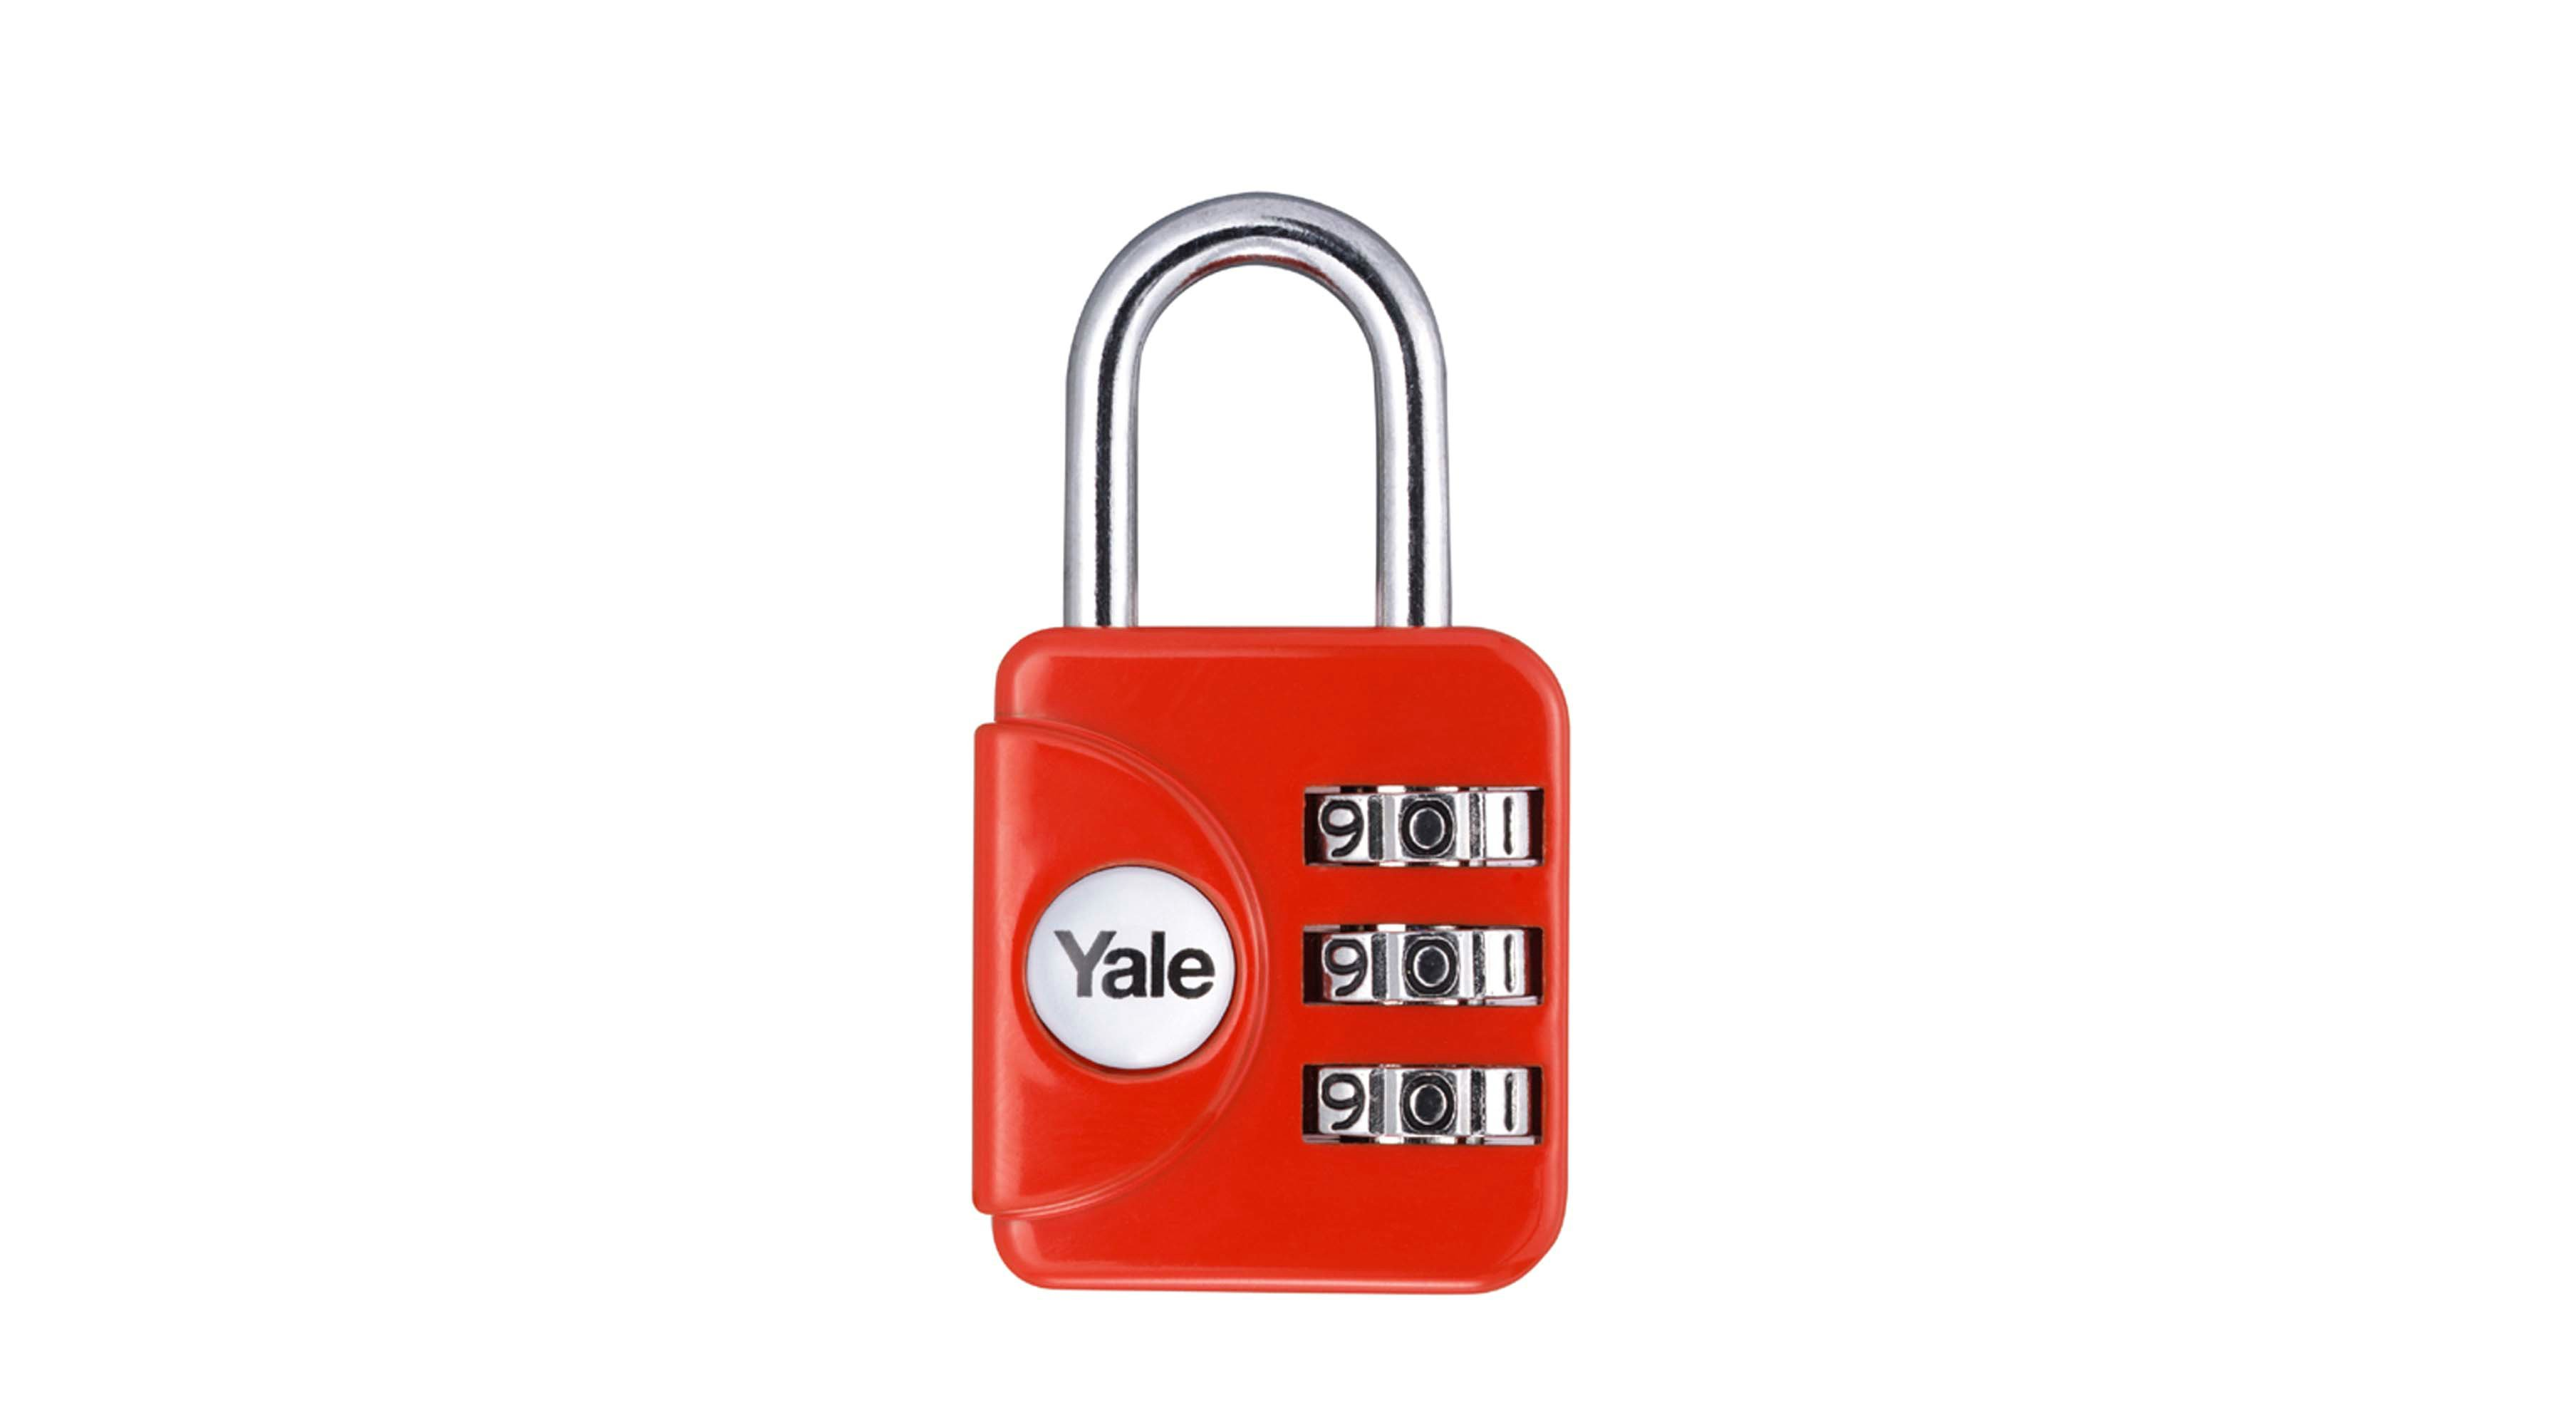 Standard travel padlock